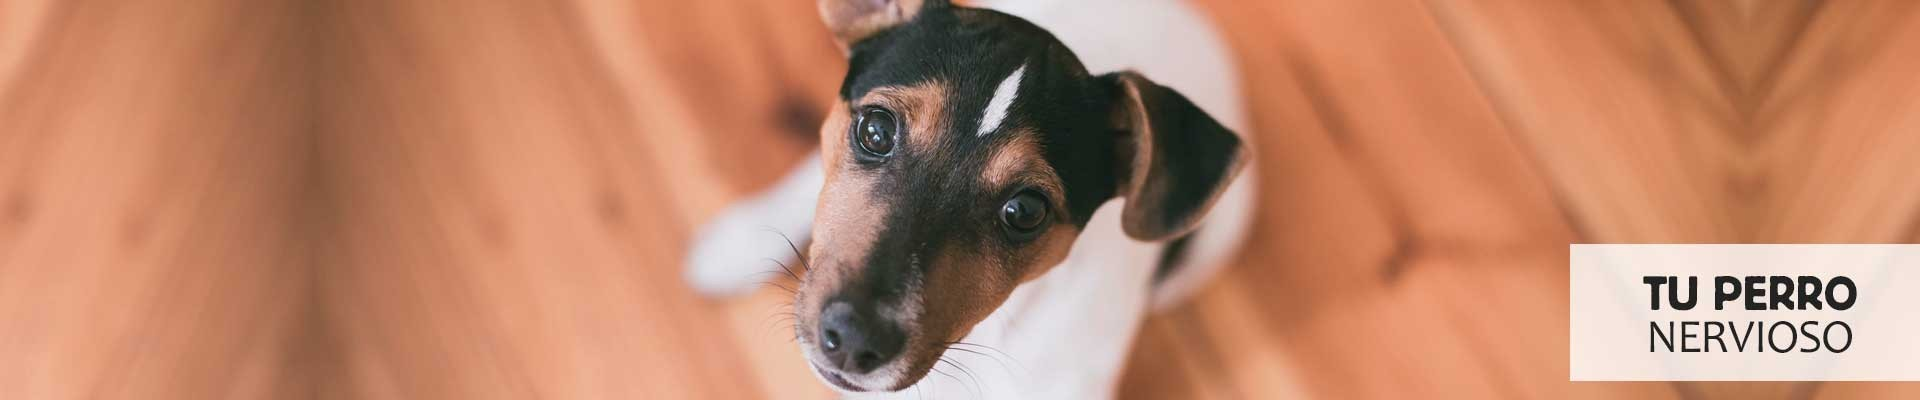 Te ayudamos con tu perro nervioso